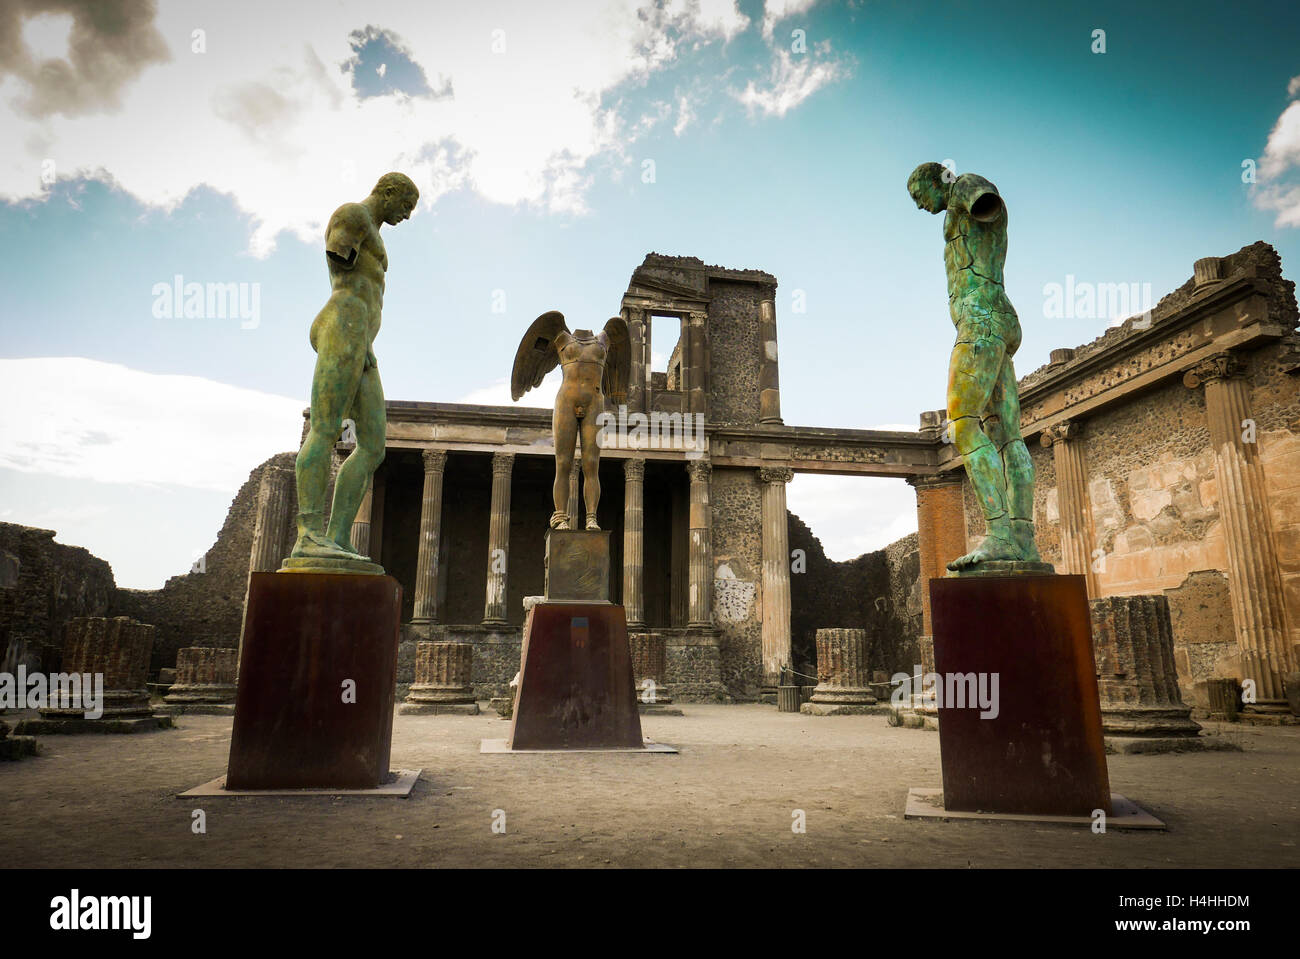 Statue in Pompeii, Italy - Stock Image